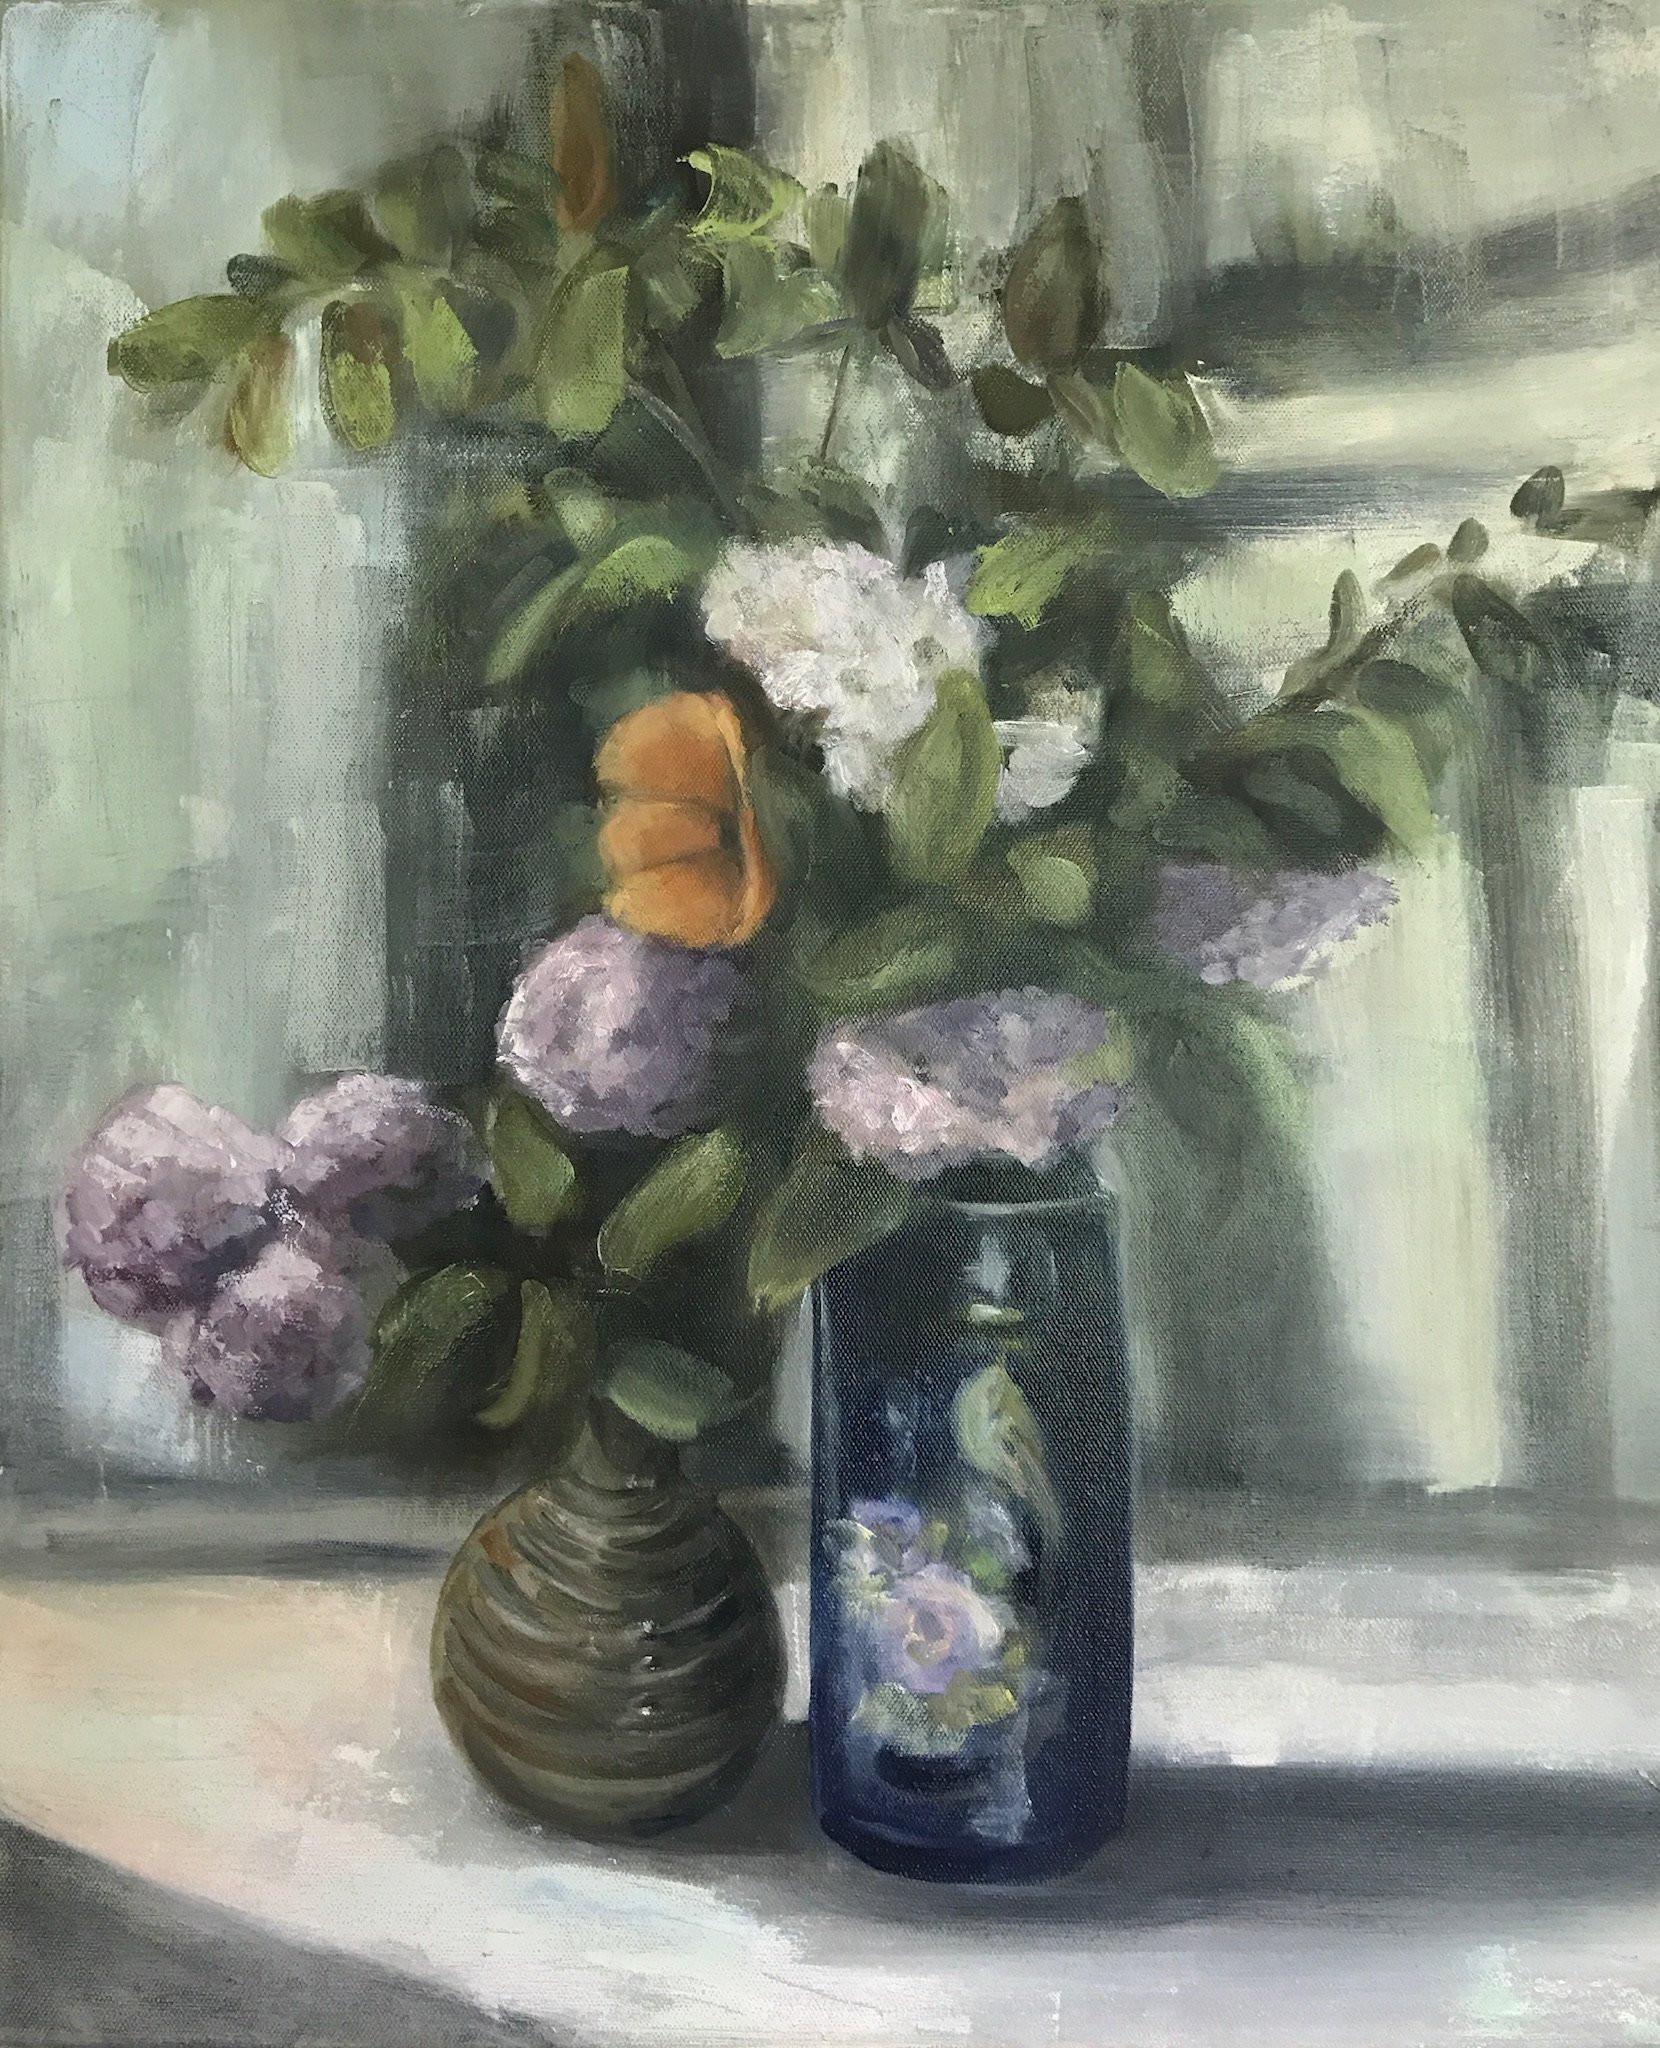 van gogh poppies vase of still life artworks for sale still life art within alyse dietrich blue still life 2017 oil painting still life